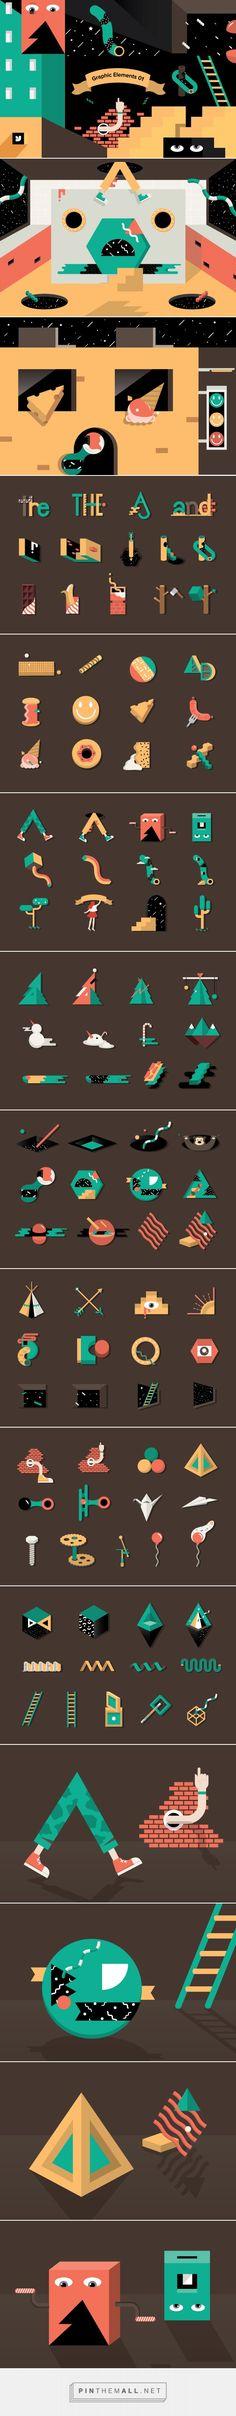 Graphic Elements 01 - Graphics - YouWorkForThem #illustrations